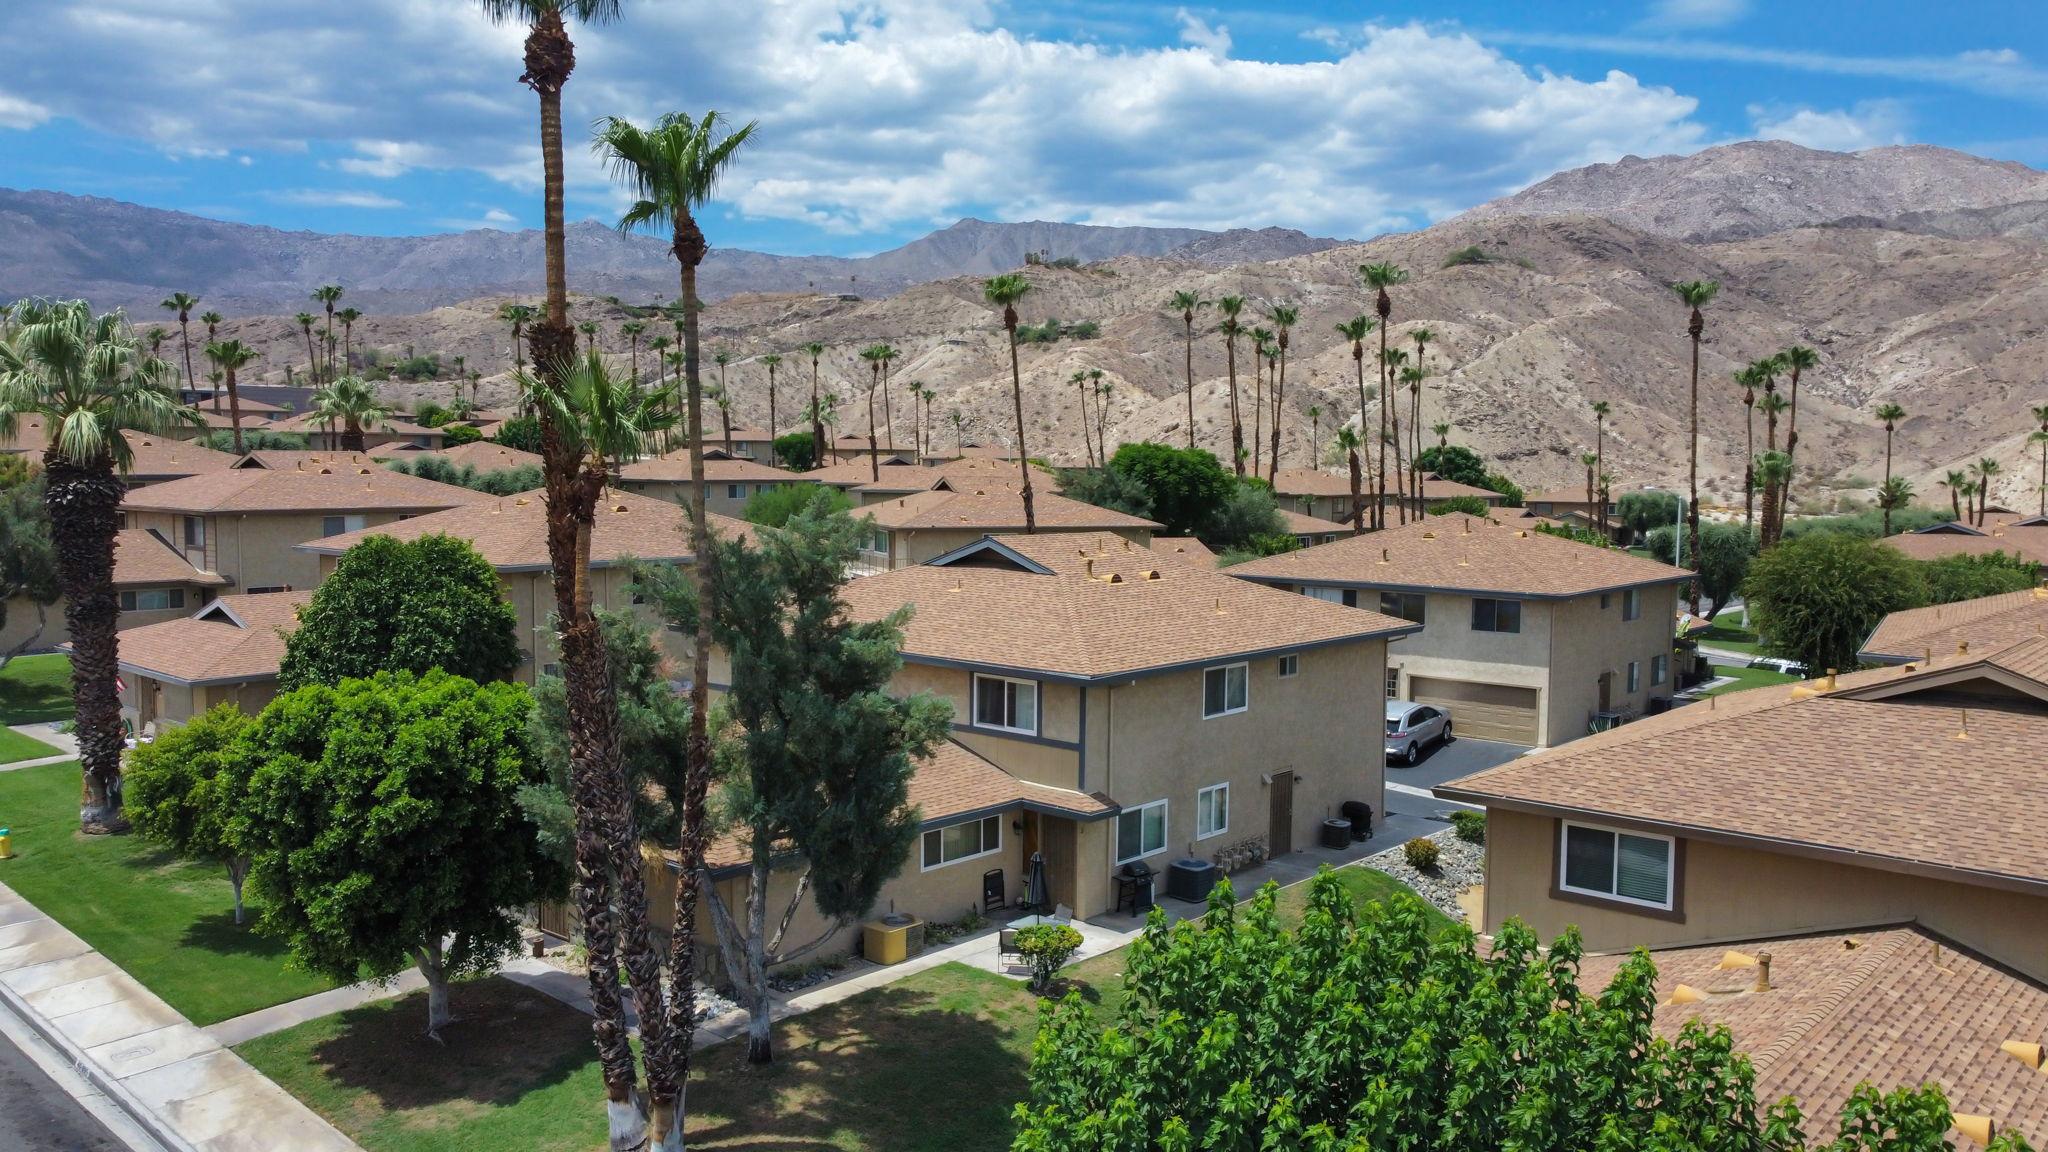 46869 CA-74, Palm Desert, CA 92260, USA Photo 1